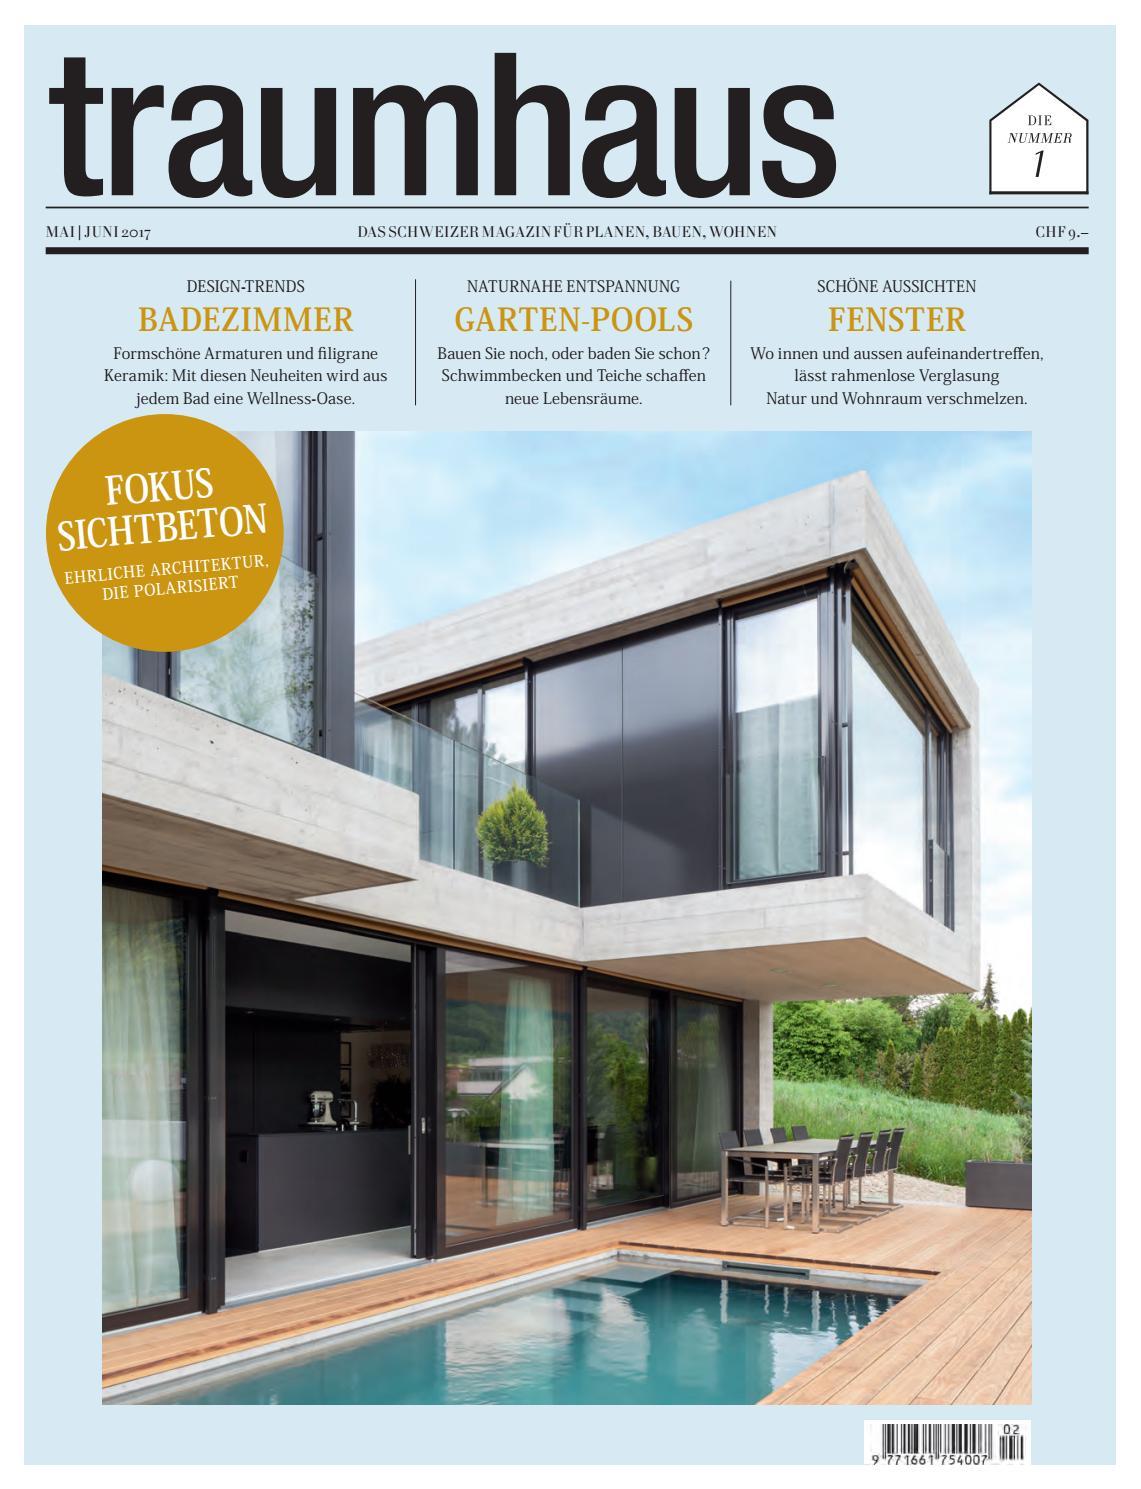 Traumhaus 02 2017 By BL Verlag AG   Issuu